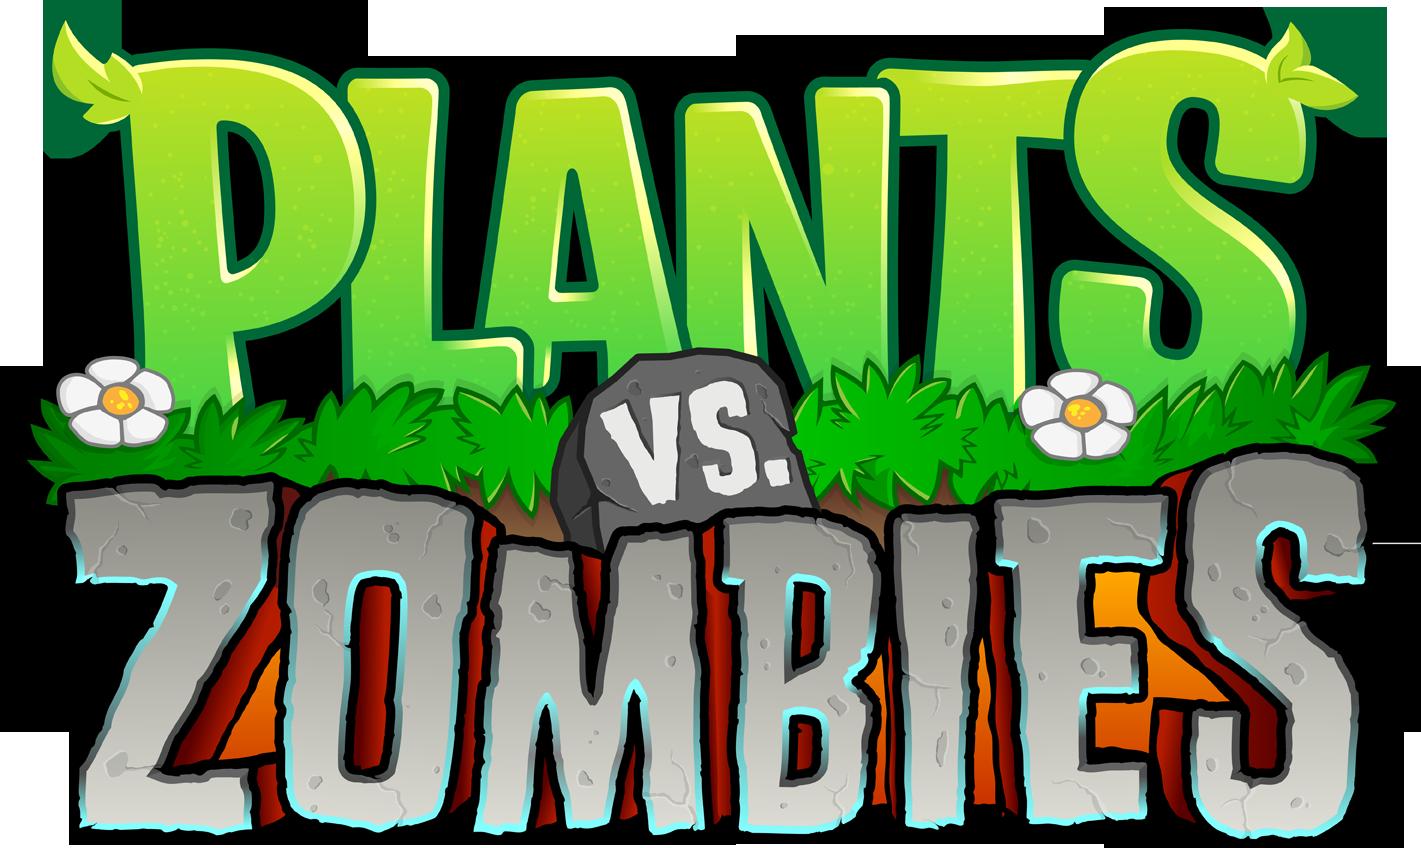 plants vs zombies 2 mac os